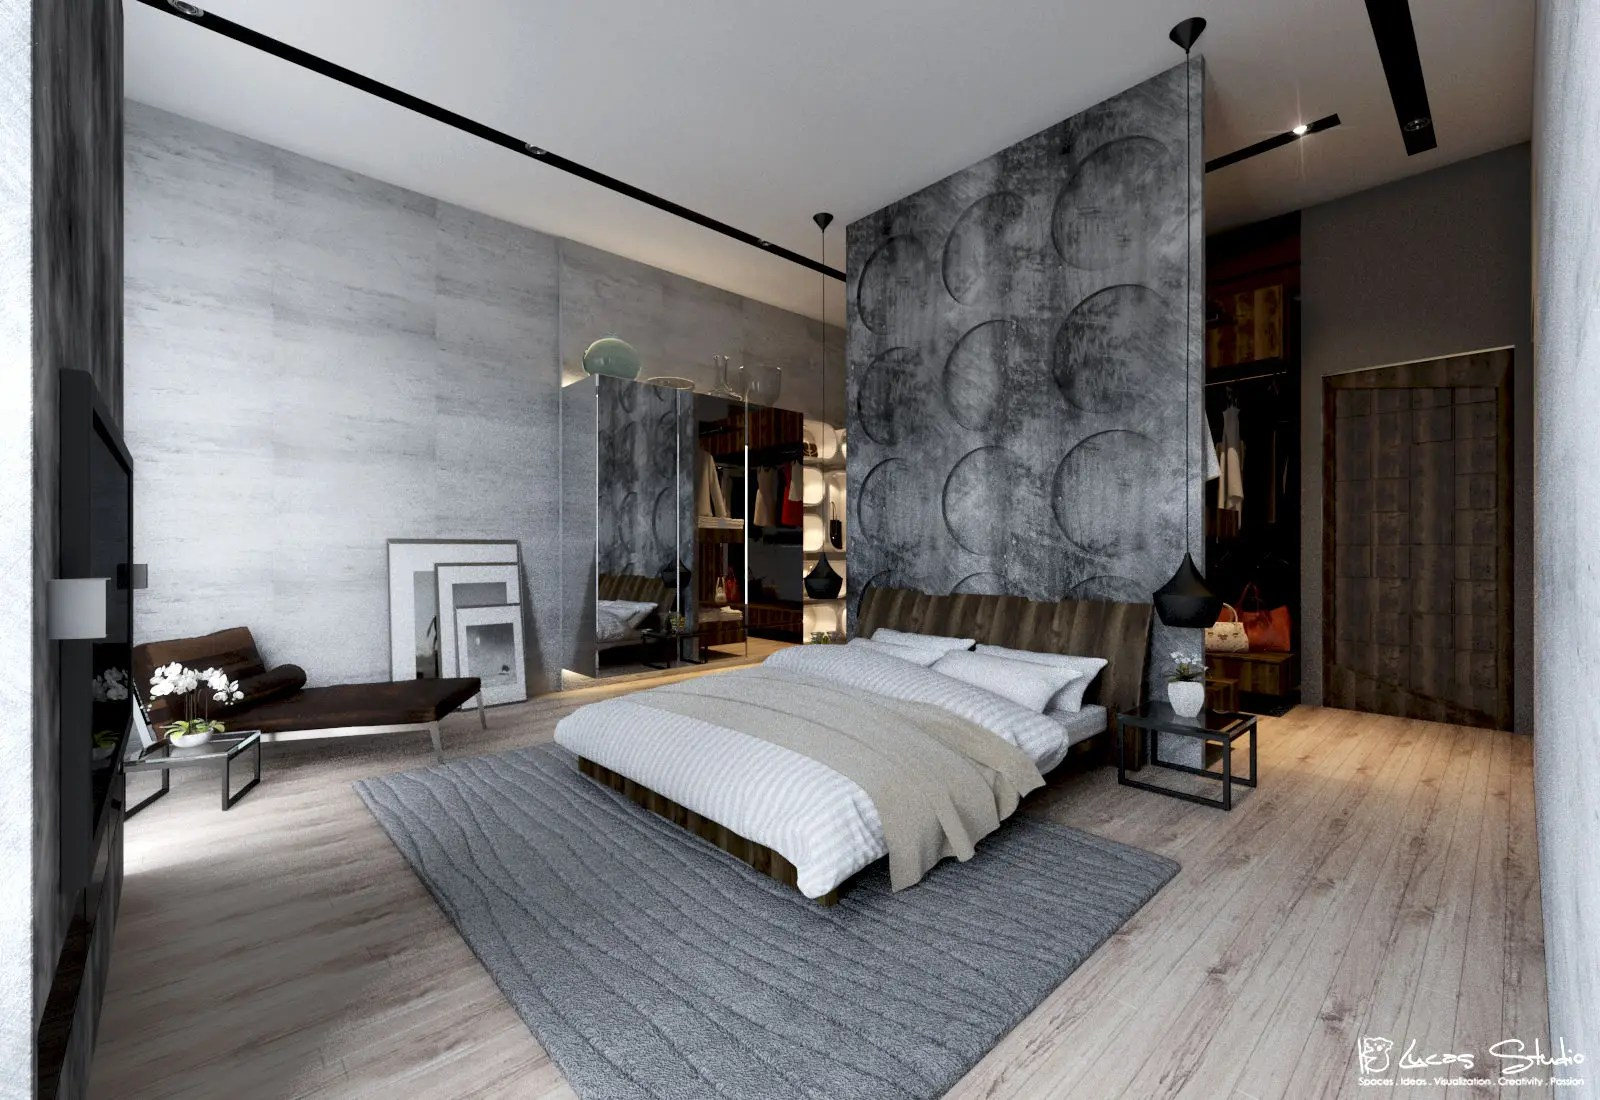 10 Beautiful Examples Of Bedroom Accent Walls - D.Signers on Minimalist:btlhhlwsf8I= Bedroom Design  id=49528